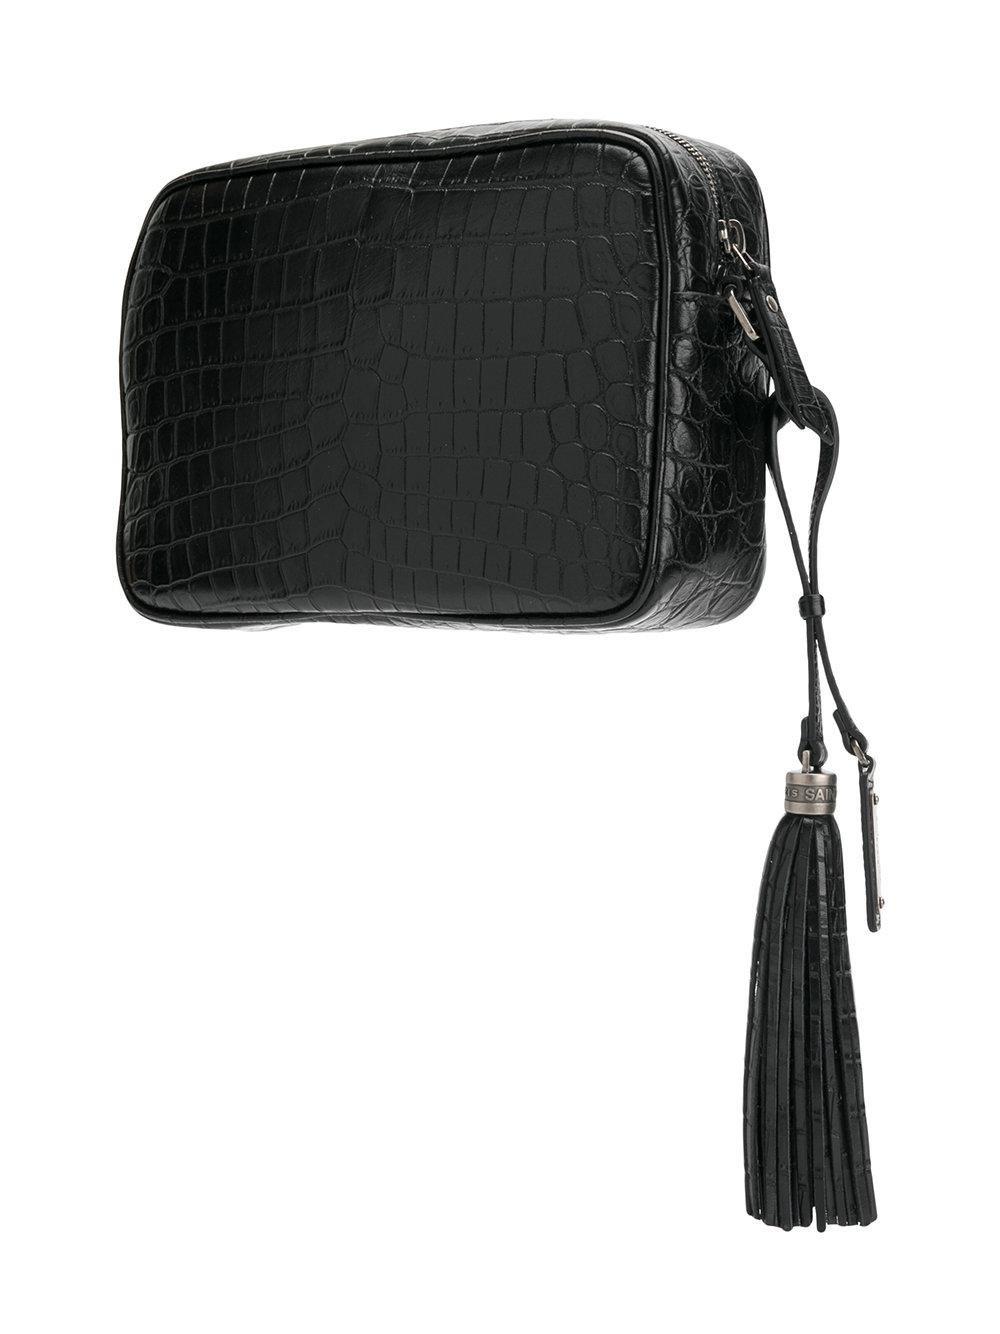 aef6edac60 Women's Black Crocodile Embossed Lou Camera Bag